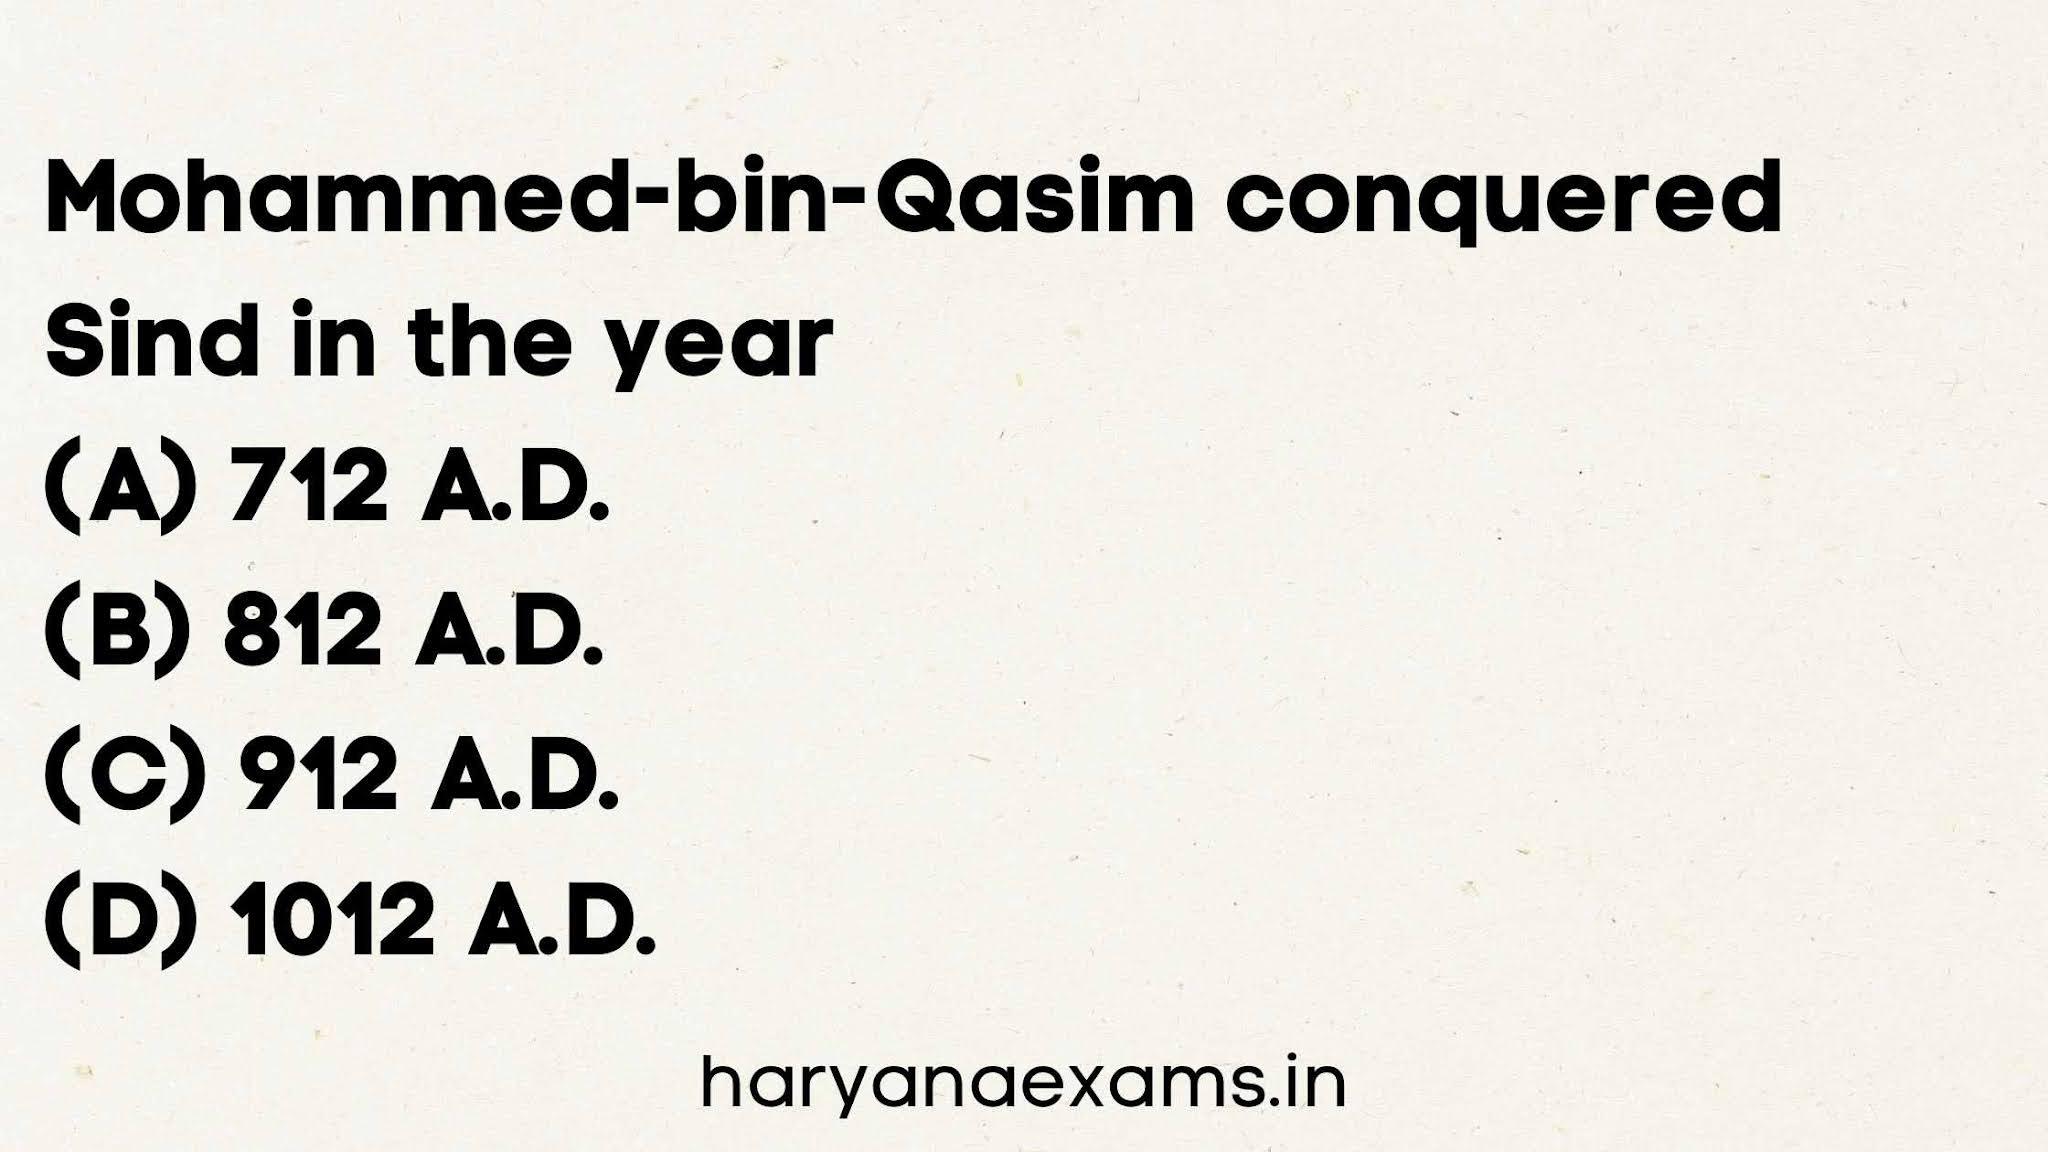 Mohammed-bin-Qasim conquered Sind in the year   (A) 712 A.D.   (B) 812 A.D.   (C) 912 A.D.   (D) 1012 A.D.